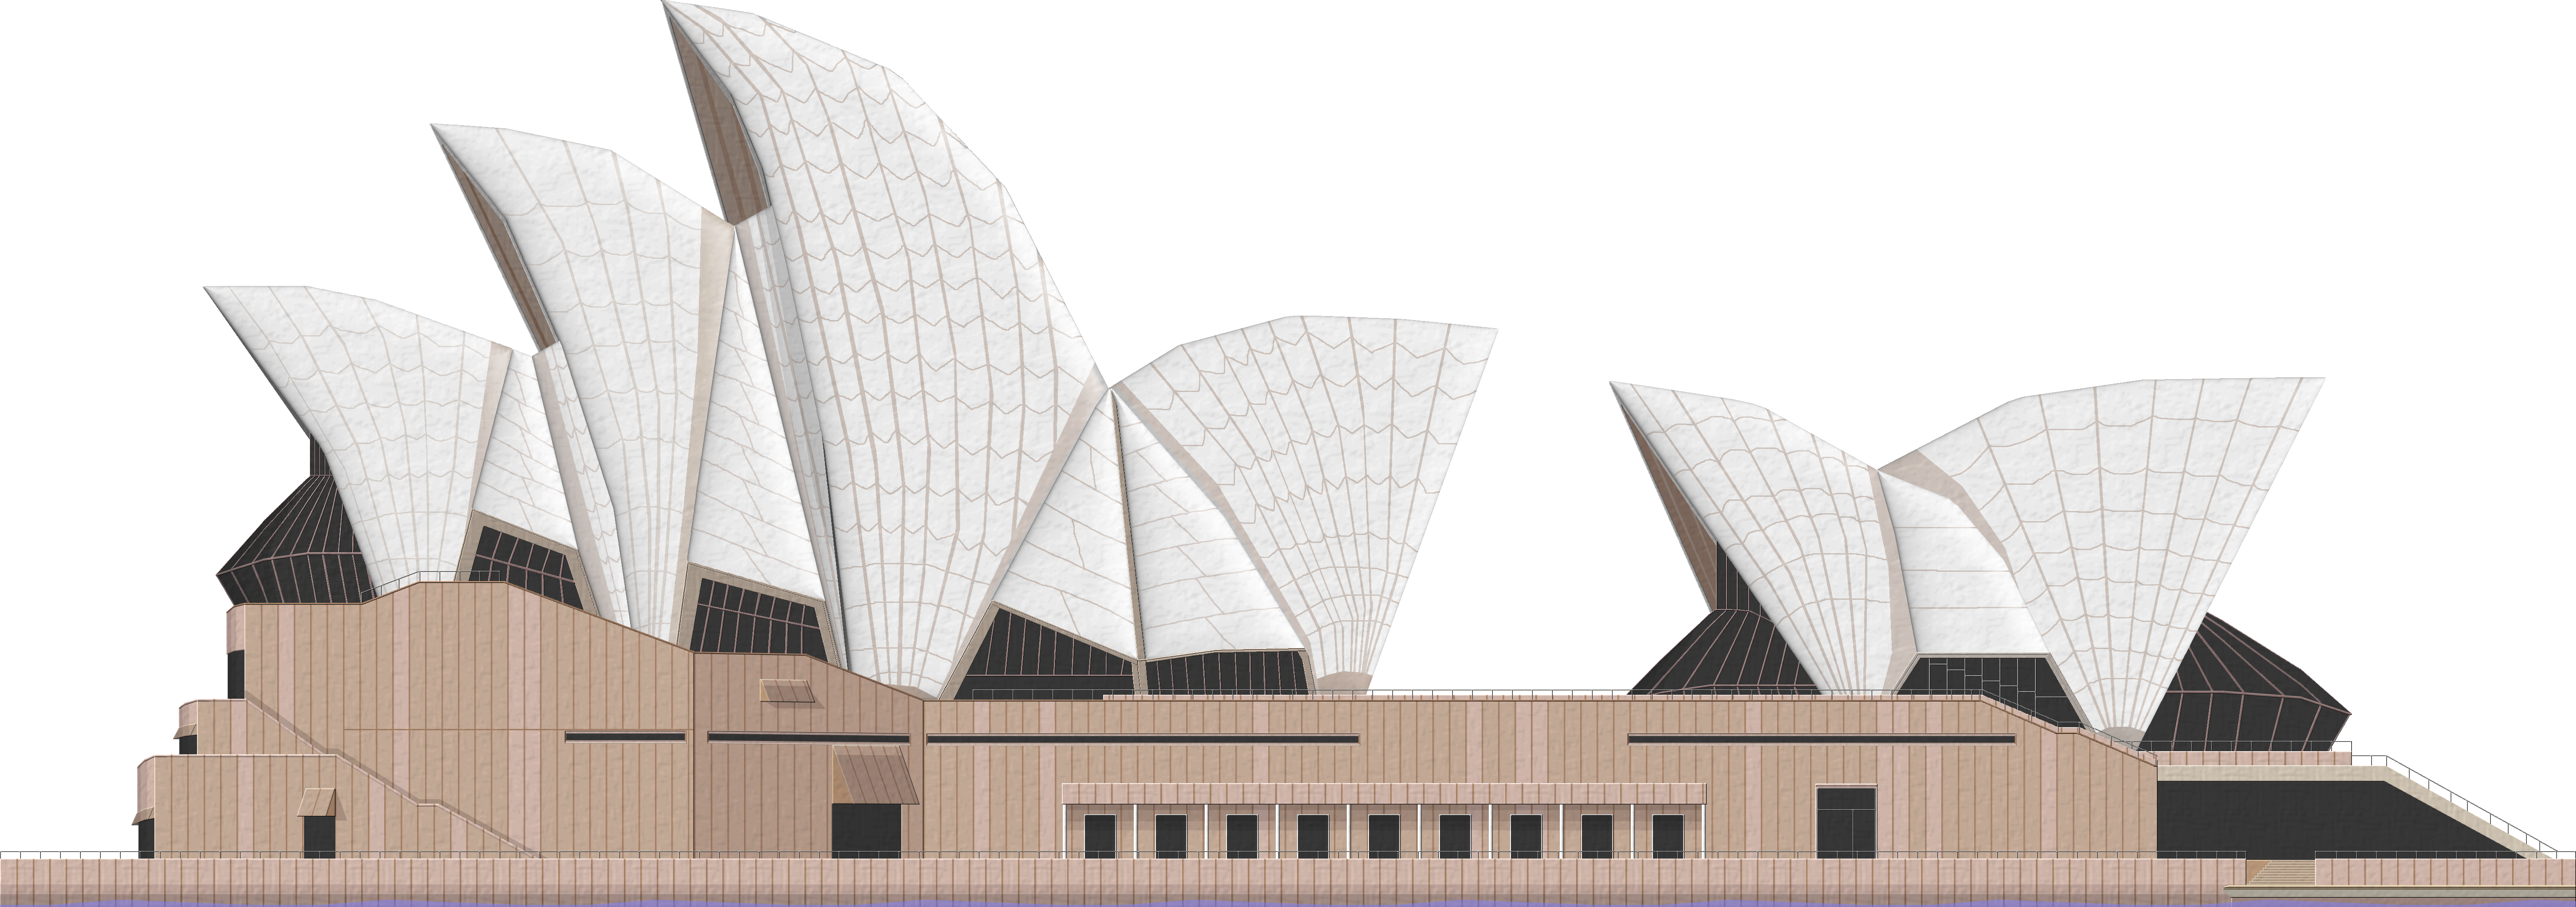 Png Sydney Opera House - Sydney Opera House Png File, Transparent background PNG HD thumbnail